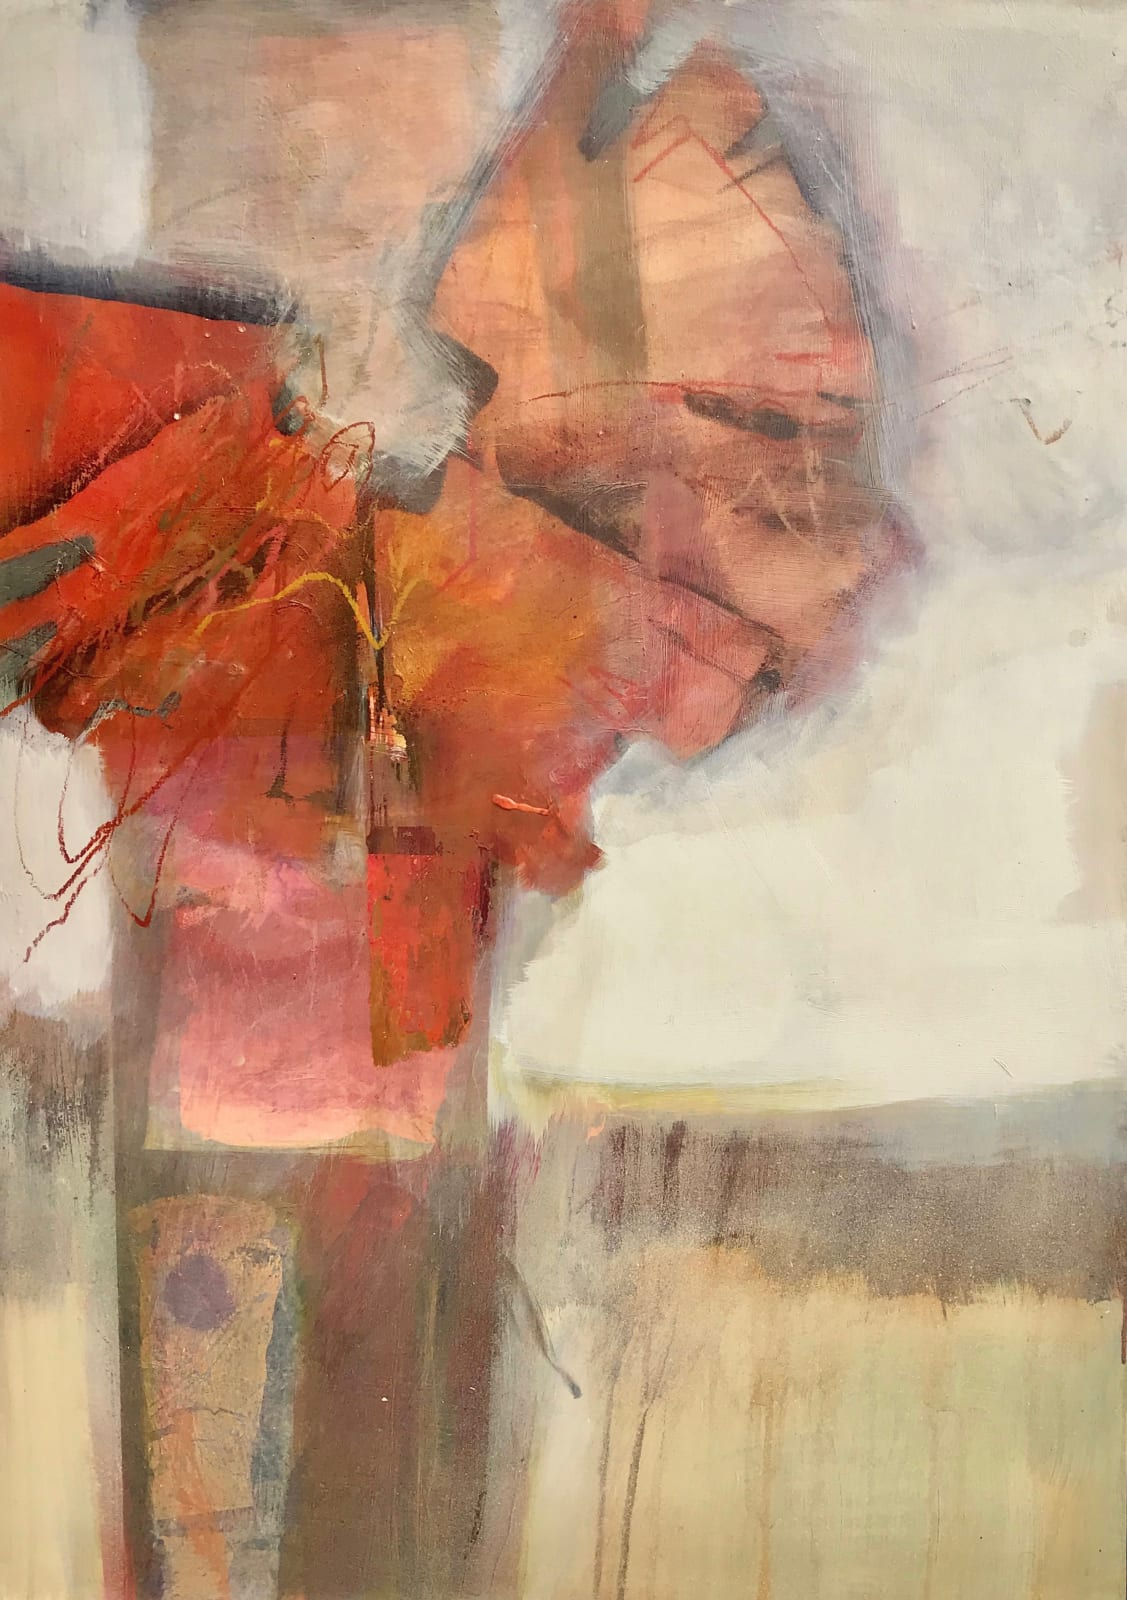 Clare Maria Wood, Enchantress, 2019